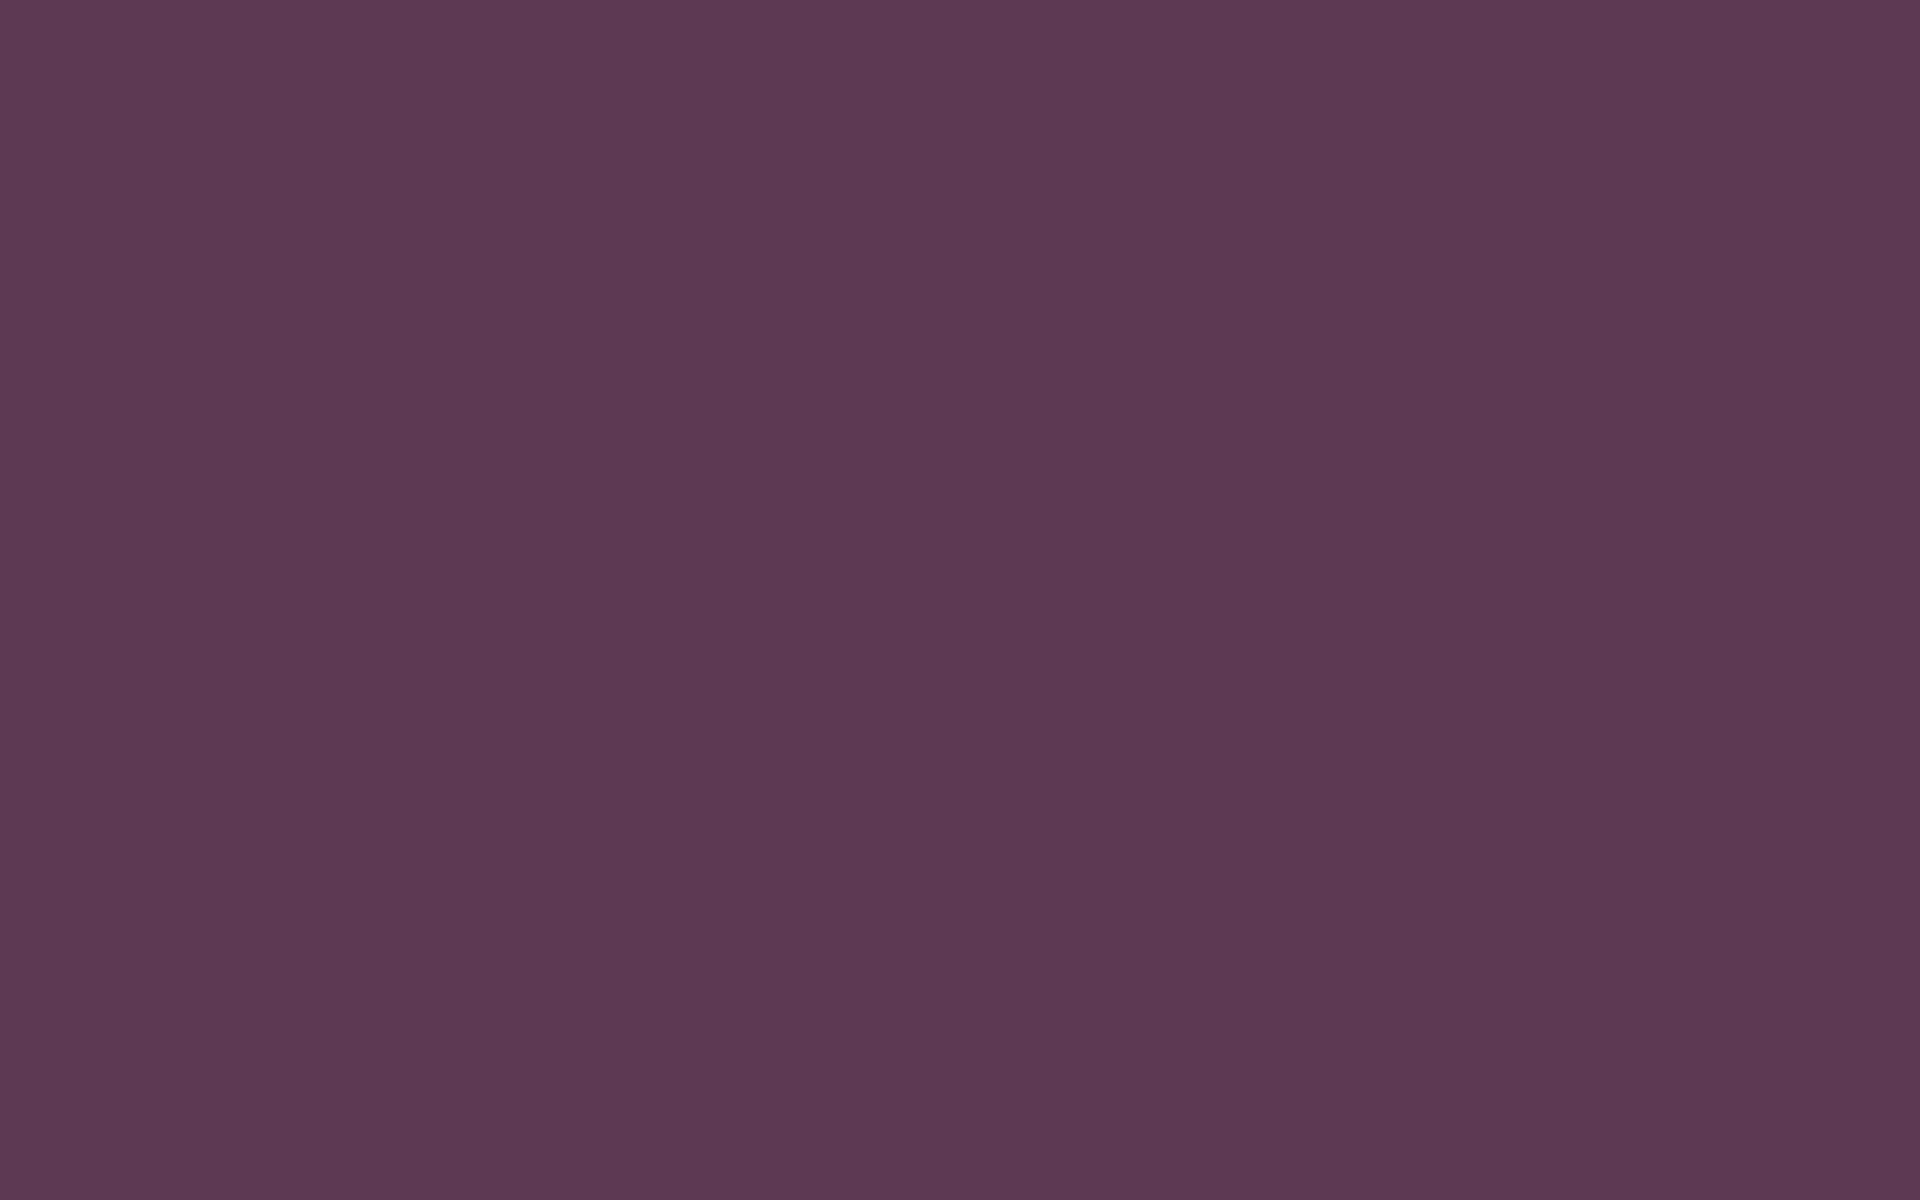 1920x1200 Dark Byzantium Solid Color Background